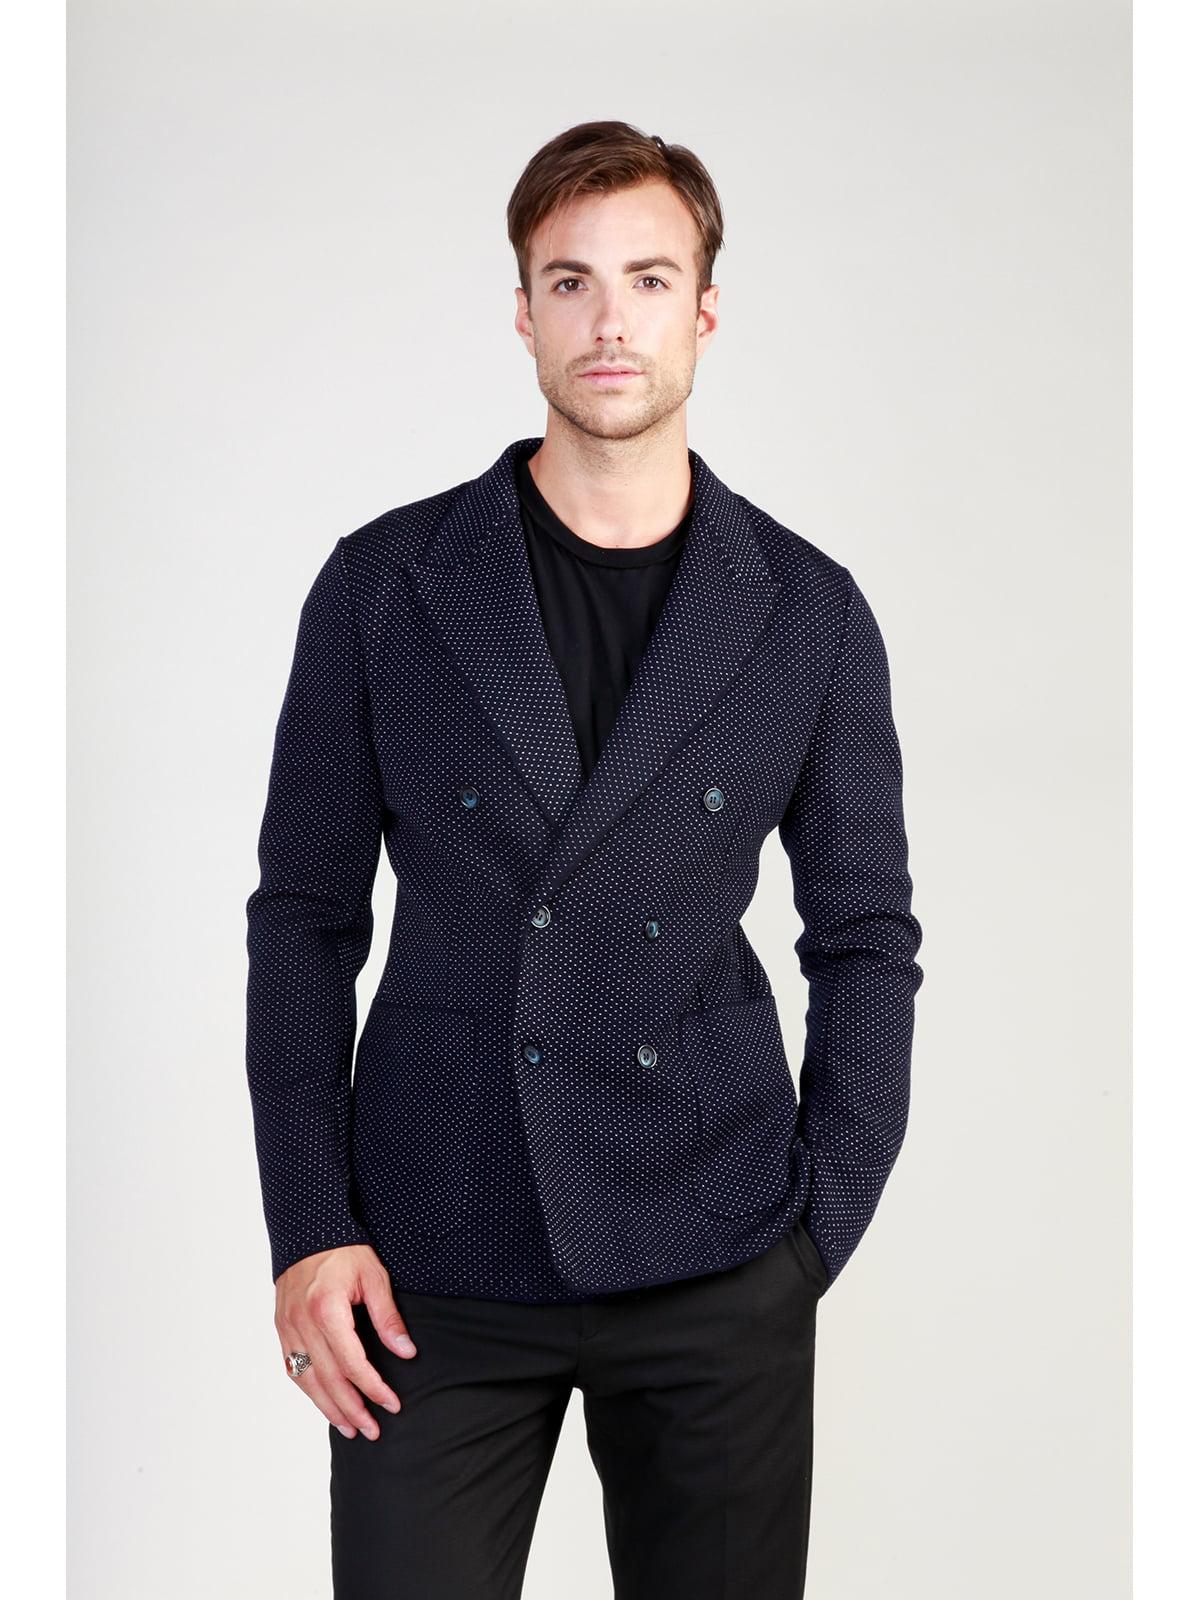 Пиджак темно-синий в рисунок | 3748934 | фото 4